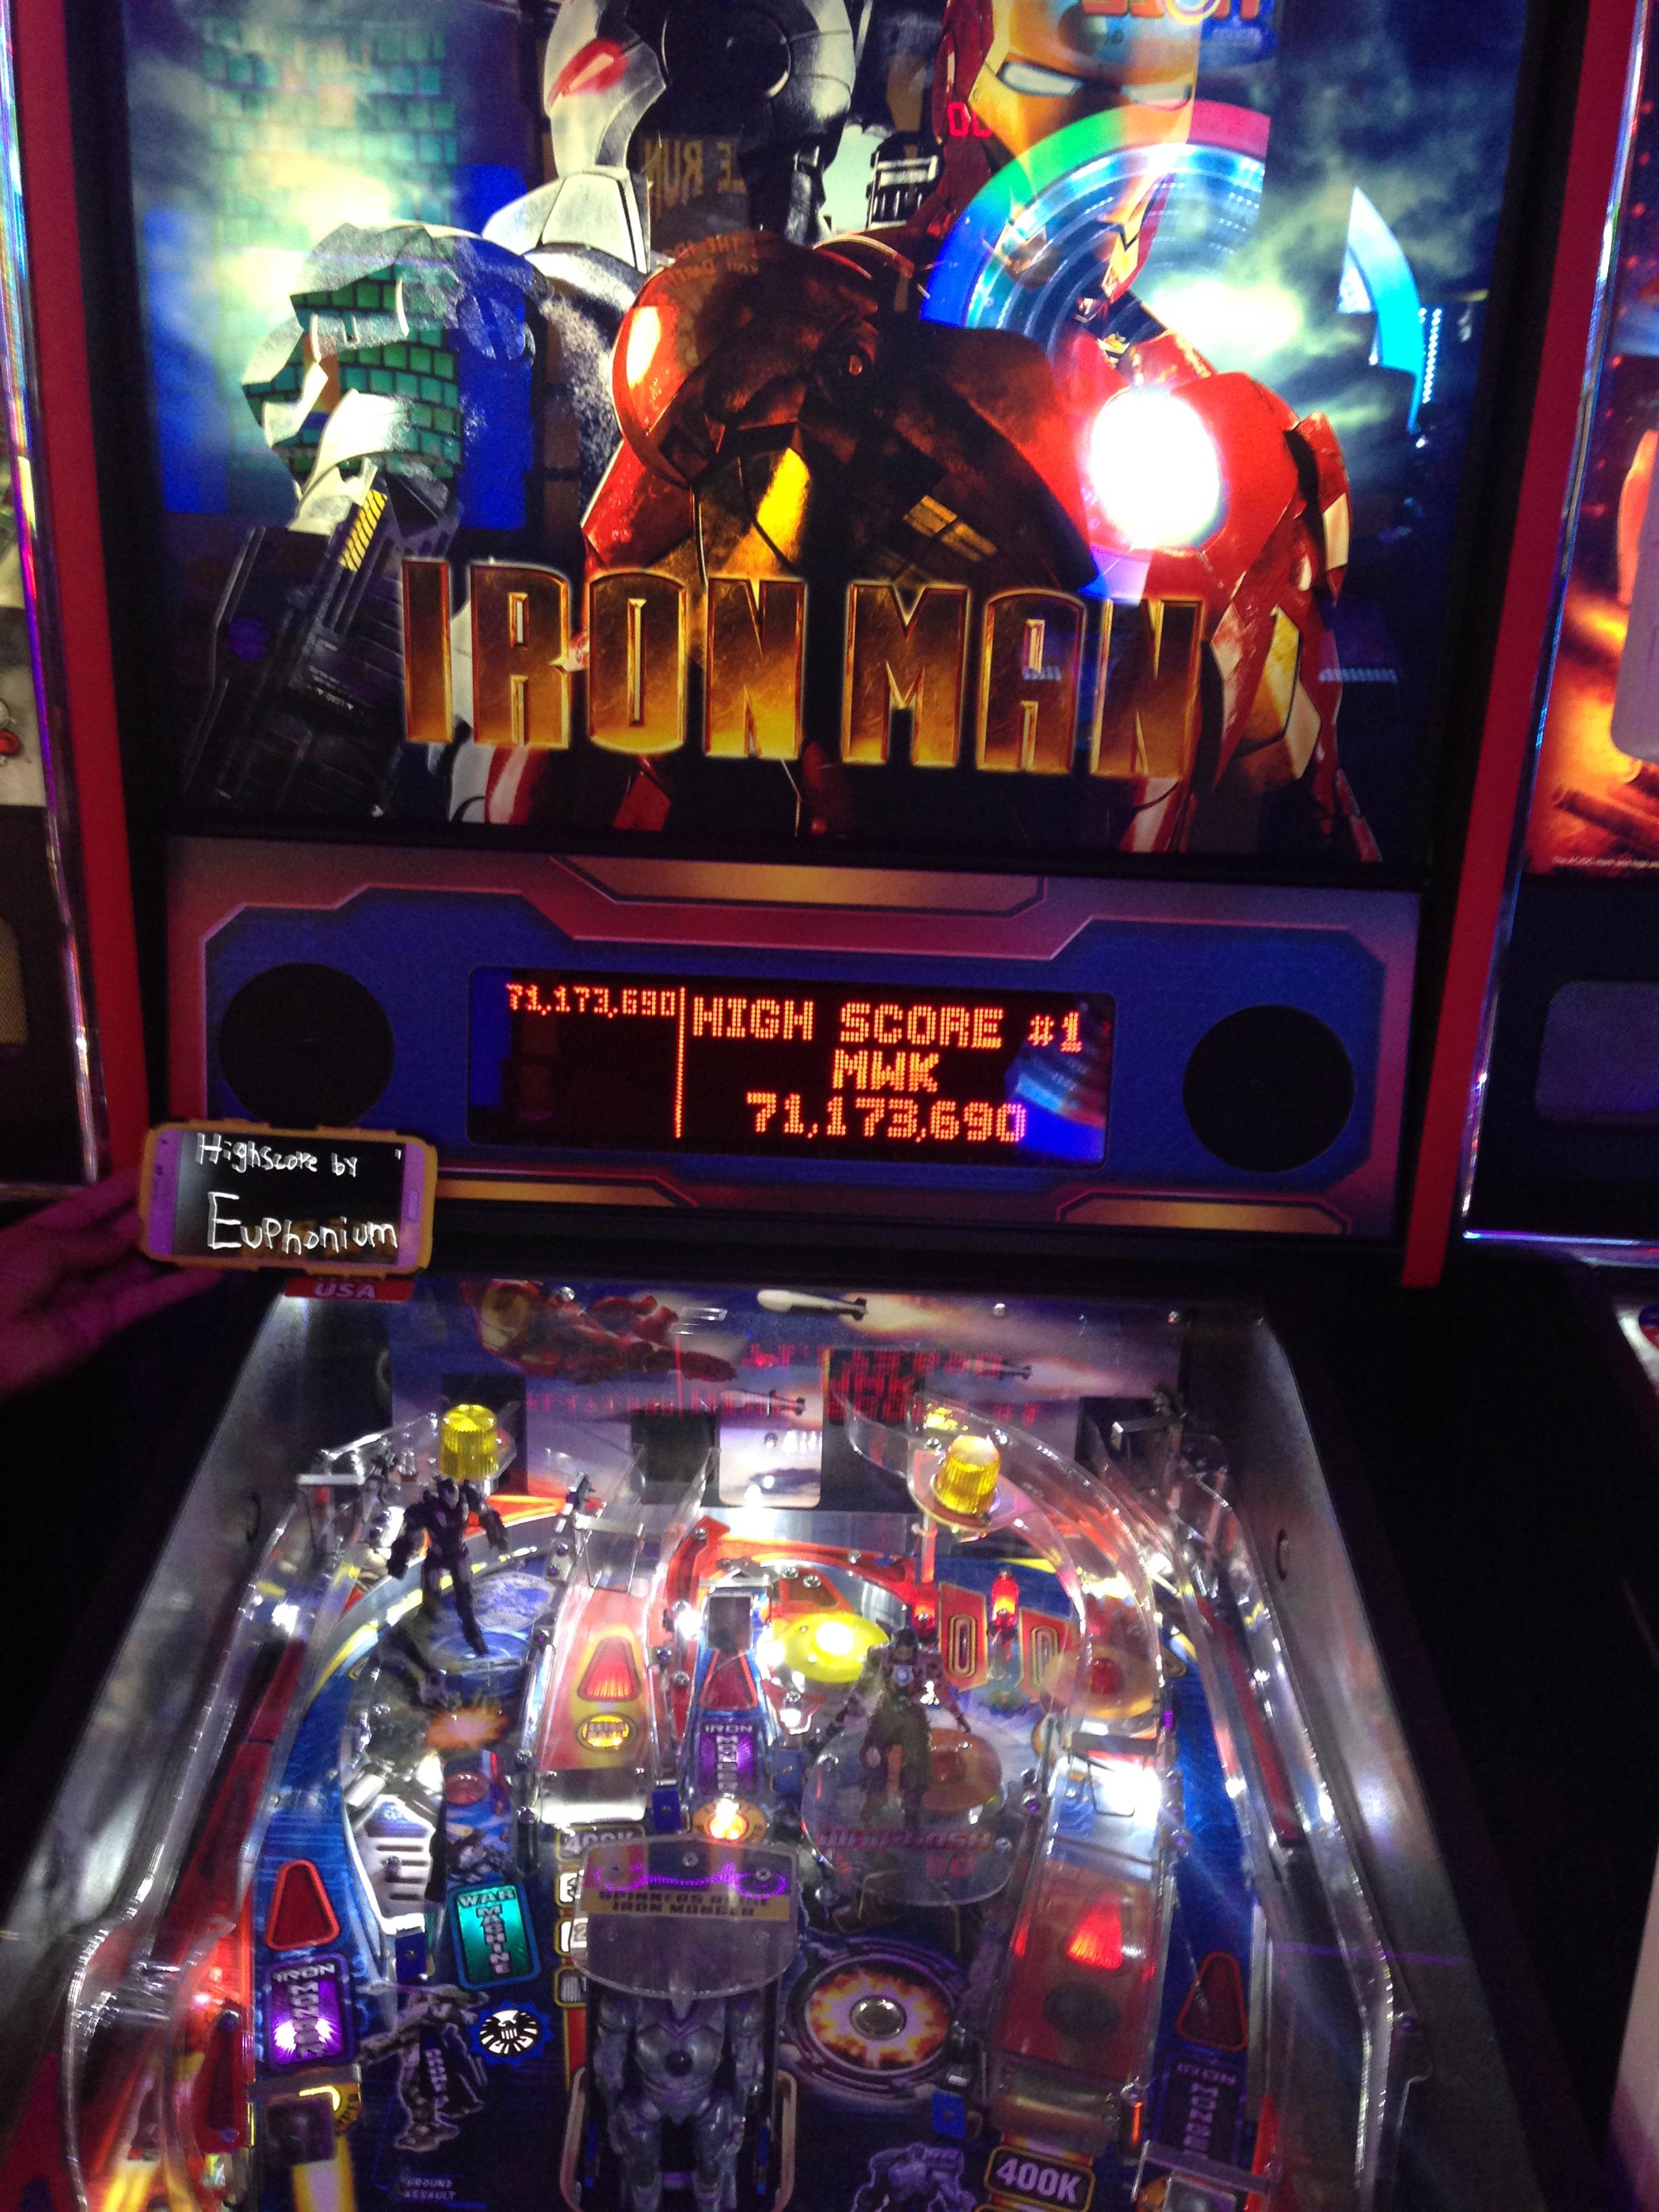 euphonium: Iron Man (Pinball: 3 Balls) 71,173,690 points on 2016-10-02 10:04:13